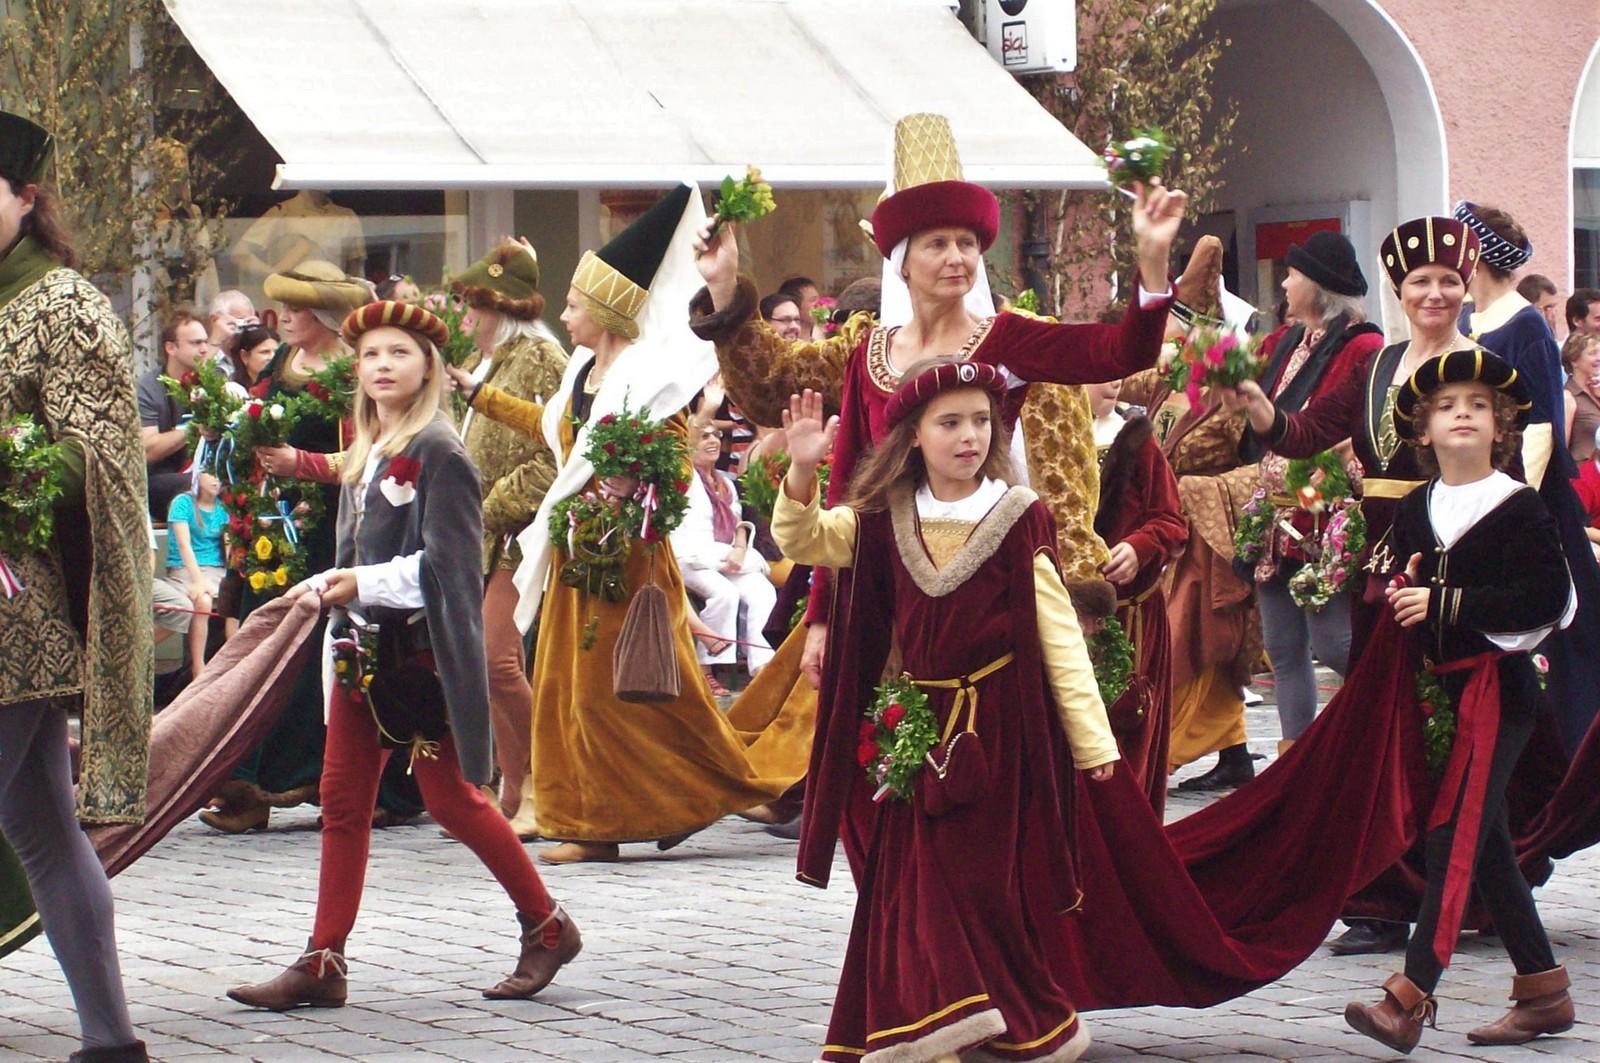 landshuter hochzeit musikgruppen